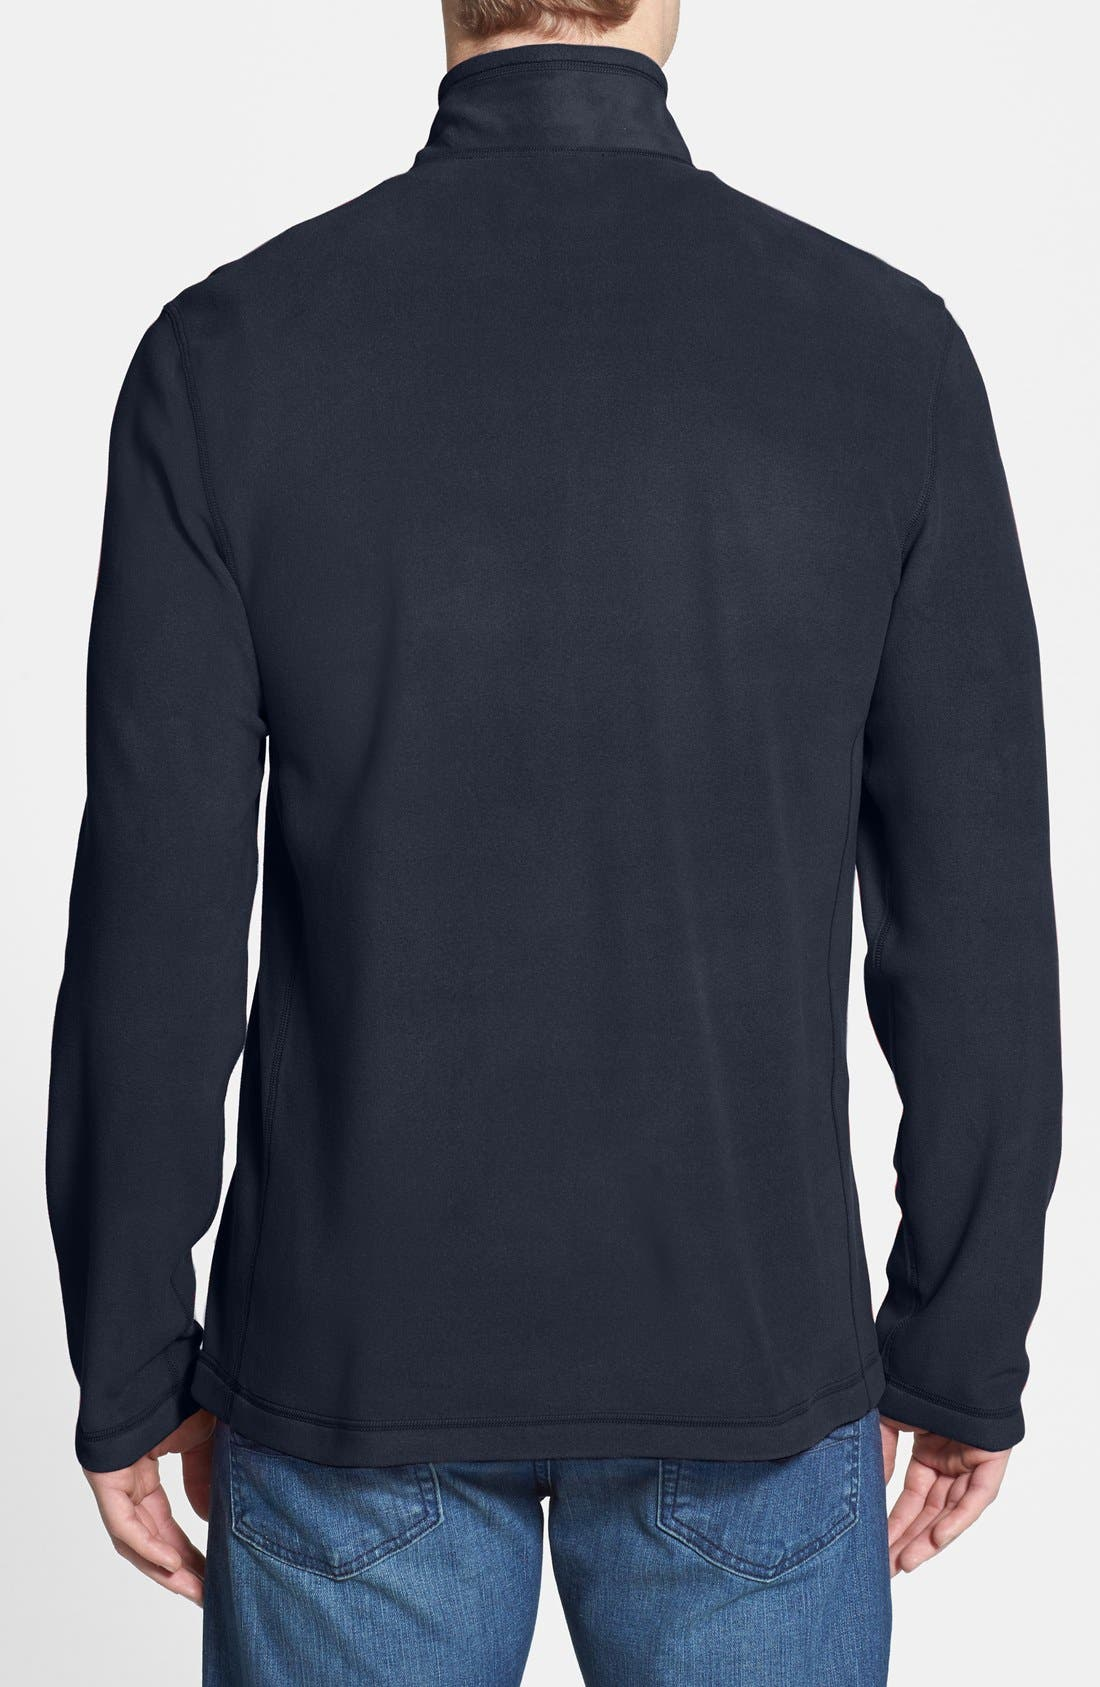 'TKA 100 Glacier' Quarter Zip Fleece Pullover,                             Alternate thumbnail 85, color,